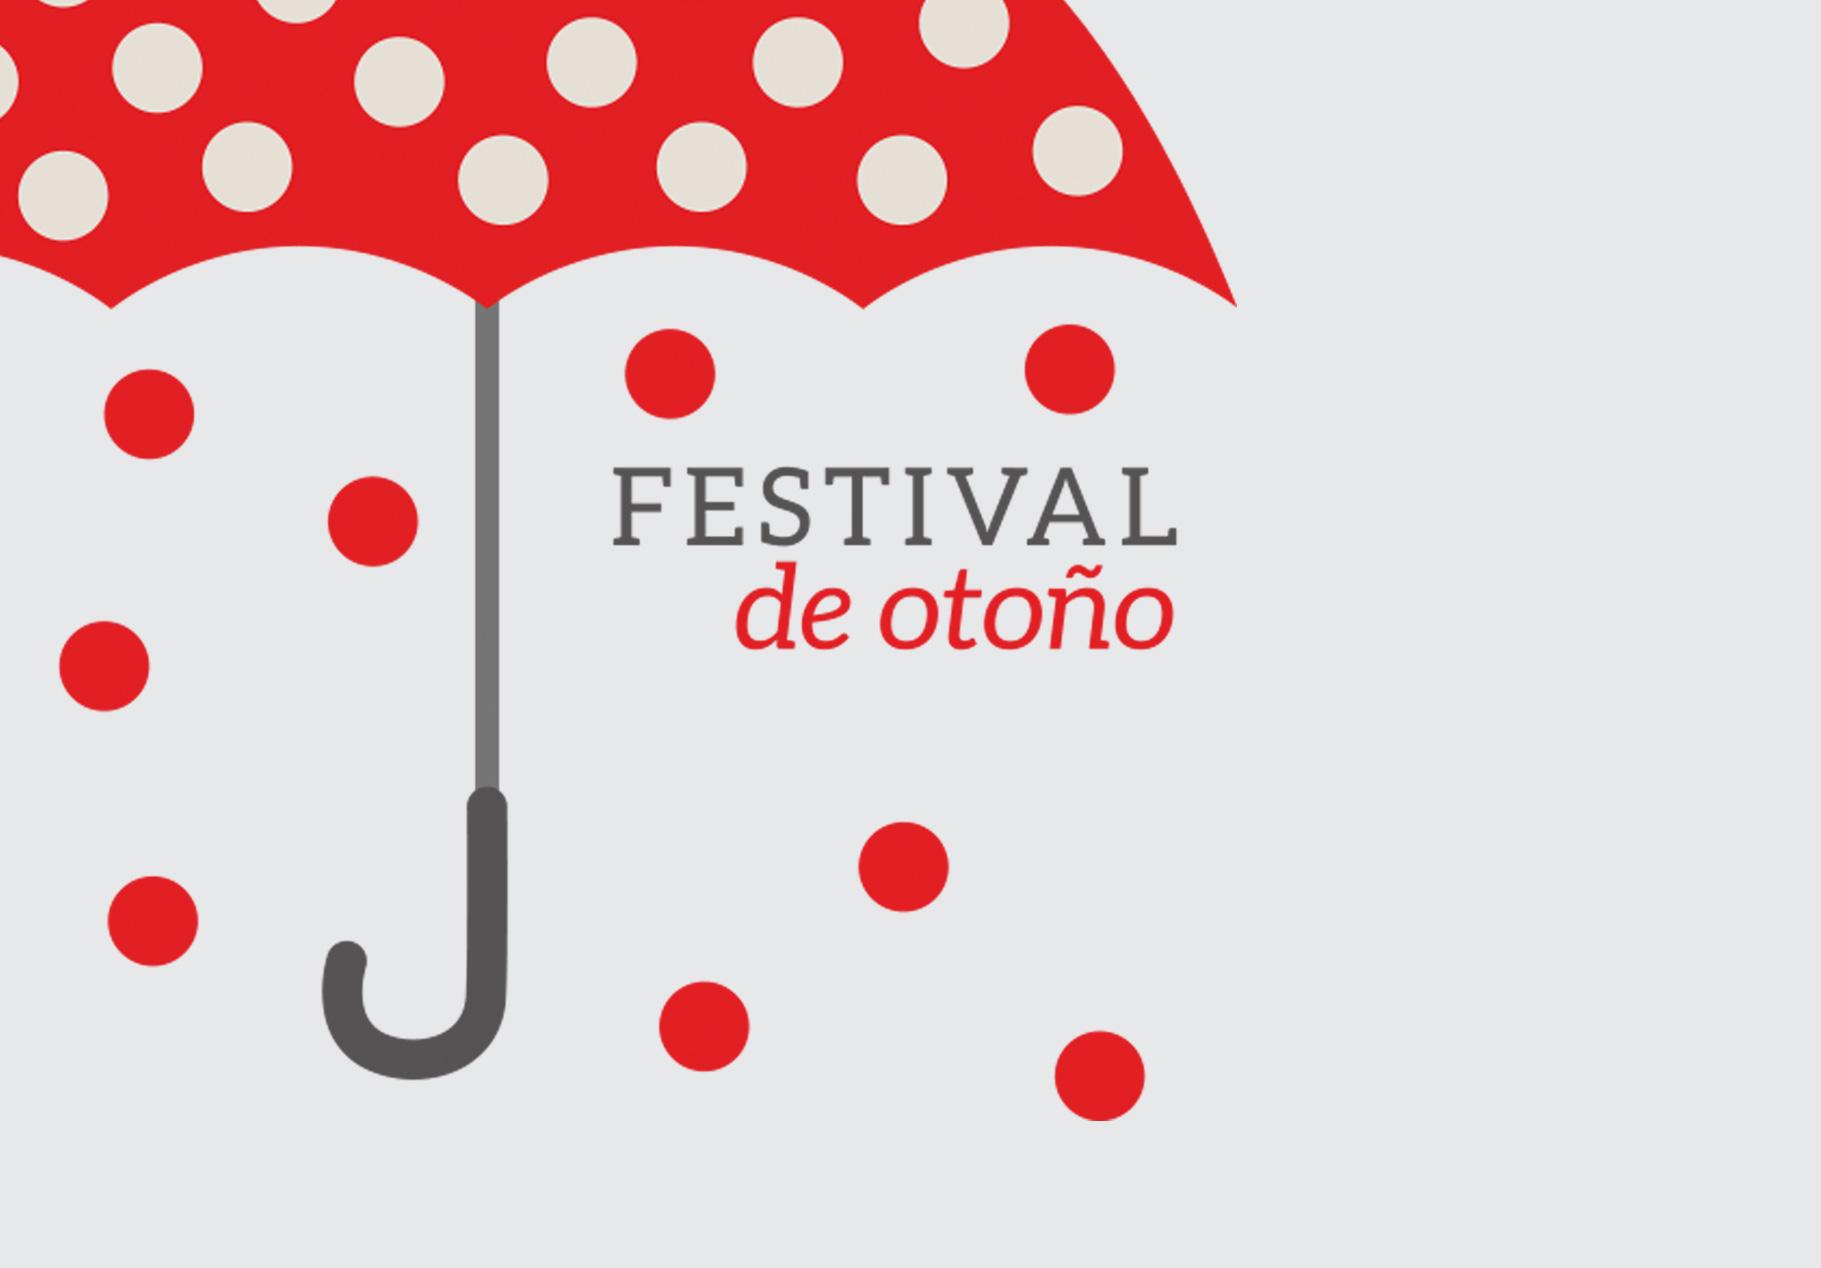 Encuentros flamencos Festival de otoño